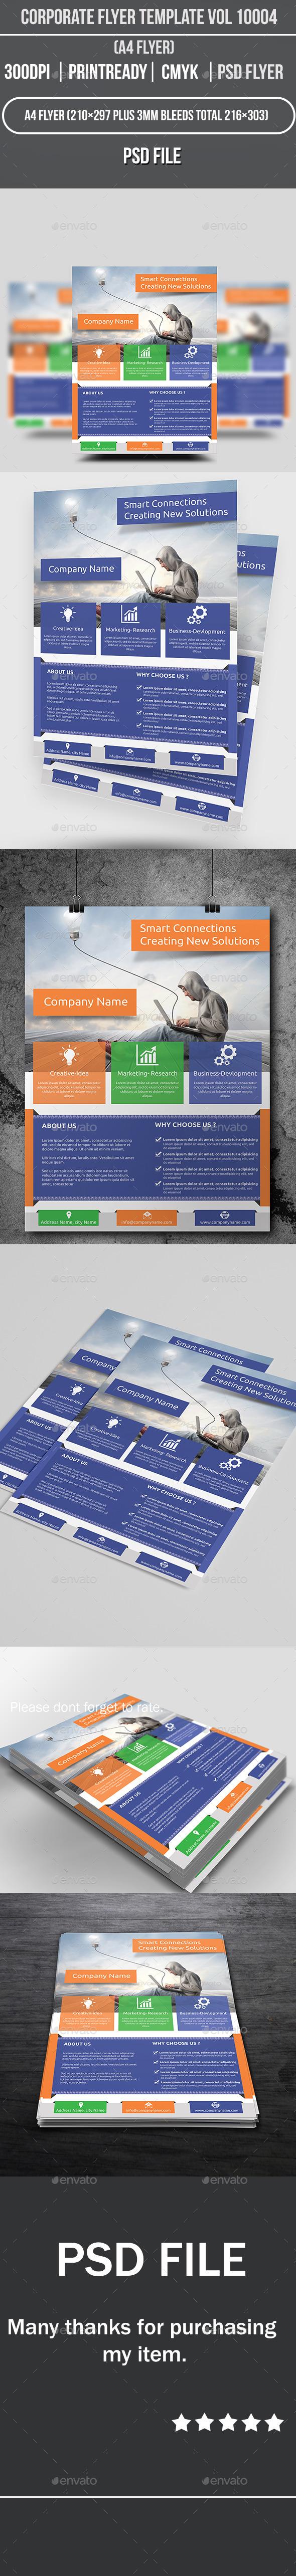 Corporate Flyer Template Vol 10004 - Corporate Flyers